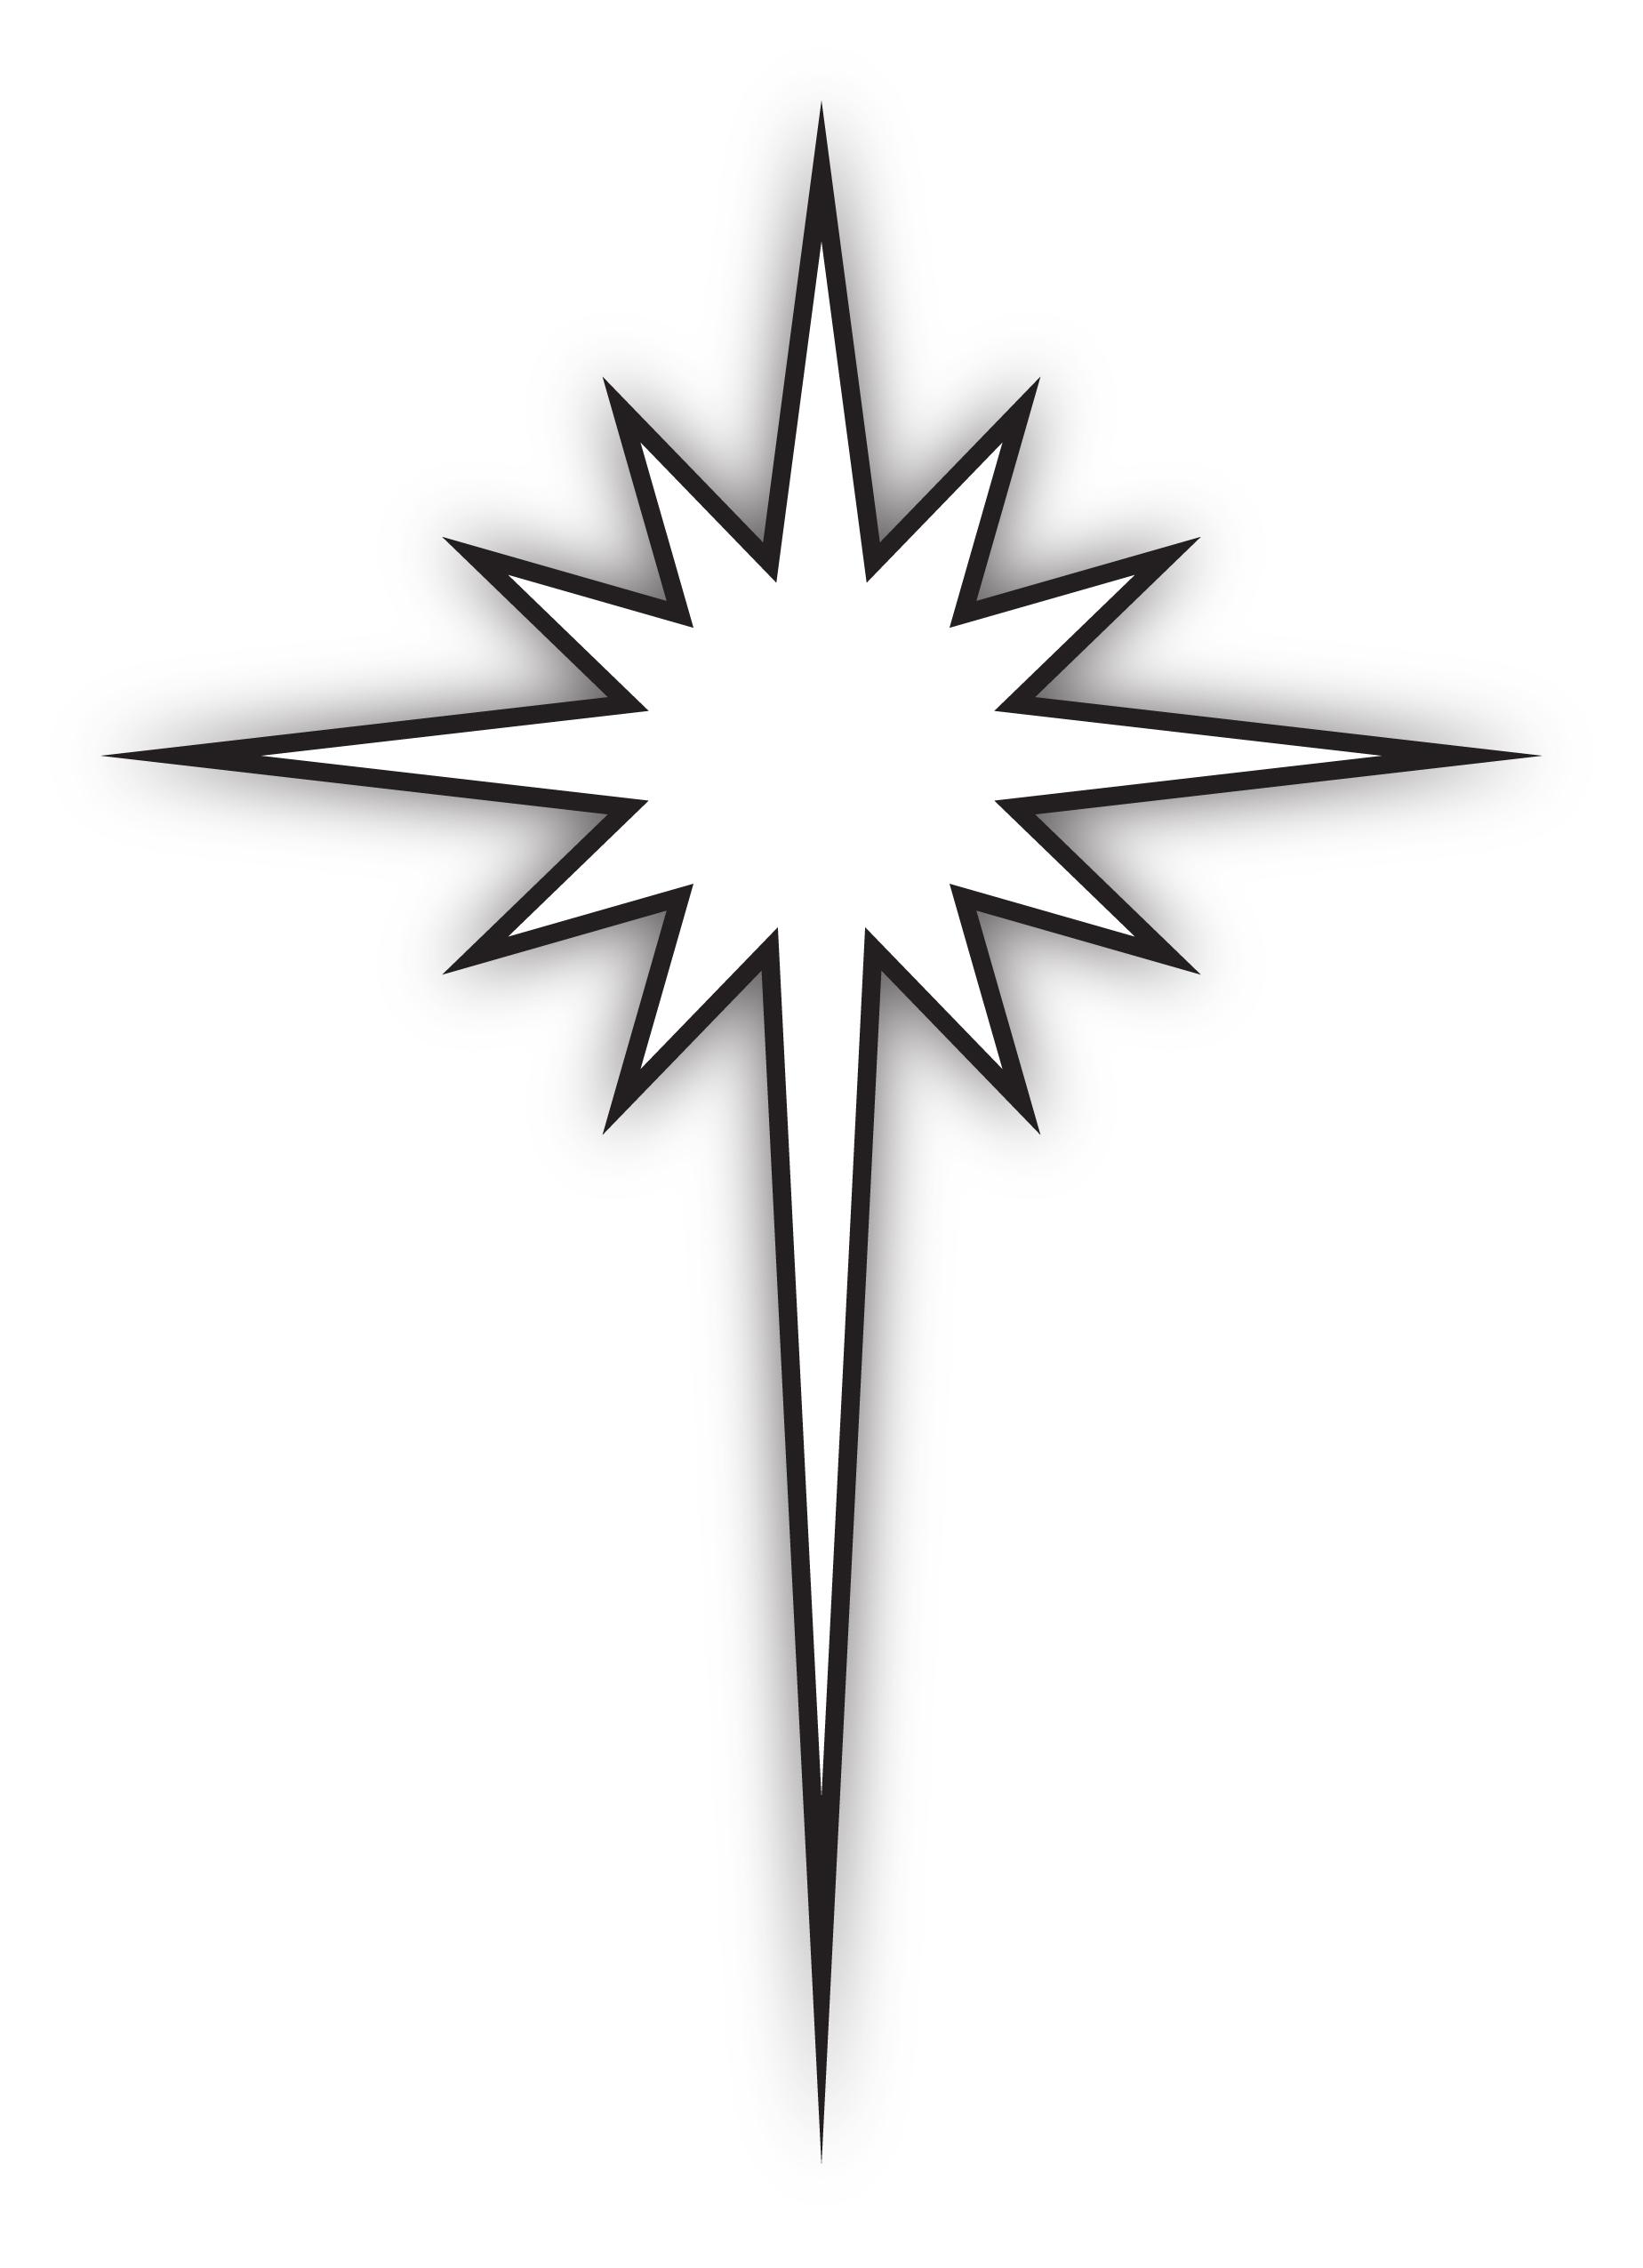 Black And White Star Of Bethlehem Car Tu-Black And White Star Of Bethlehem Car Tuning-5